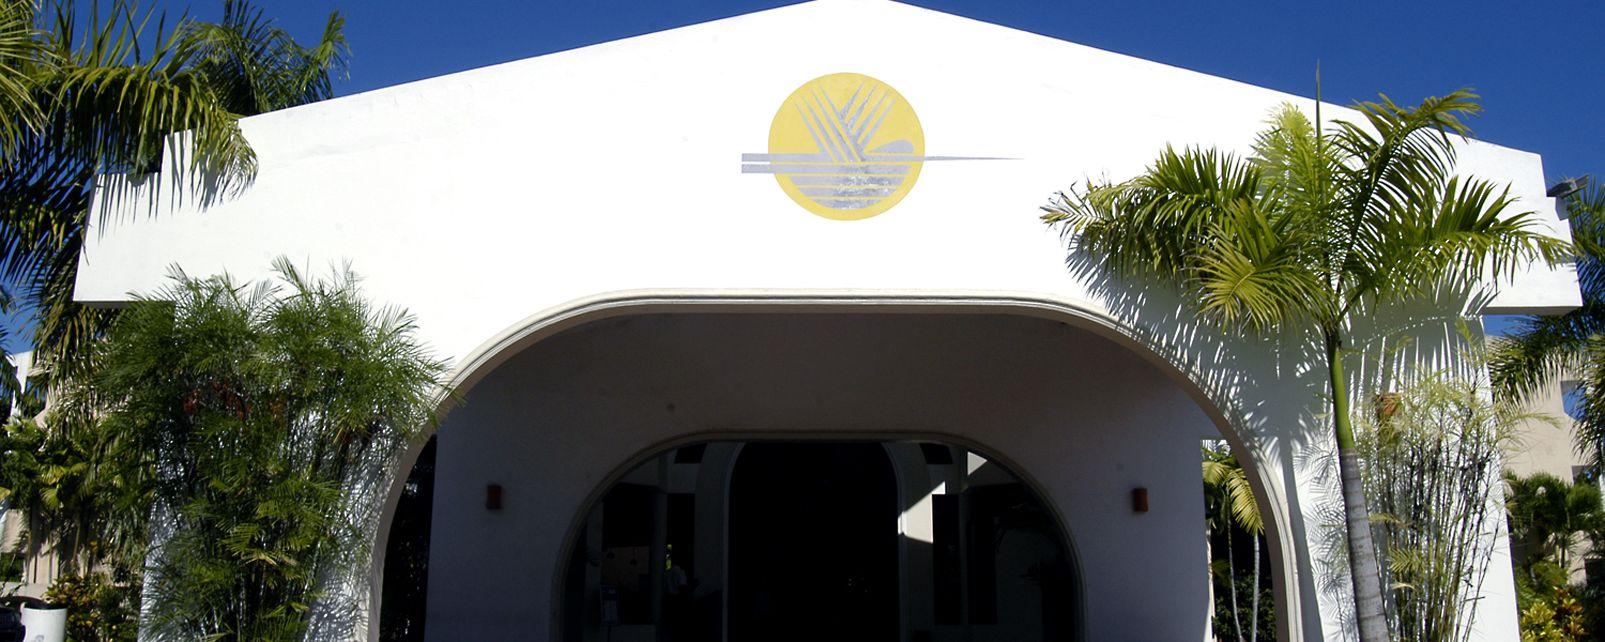 Hôtel Camino del Sol